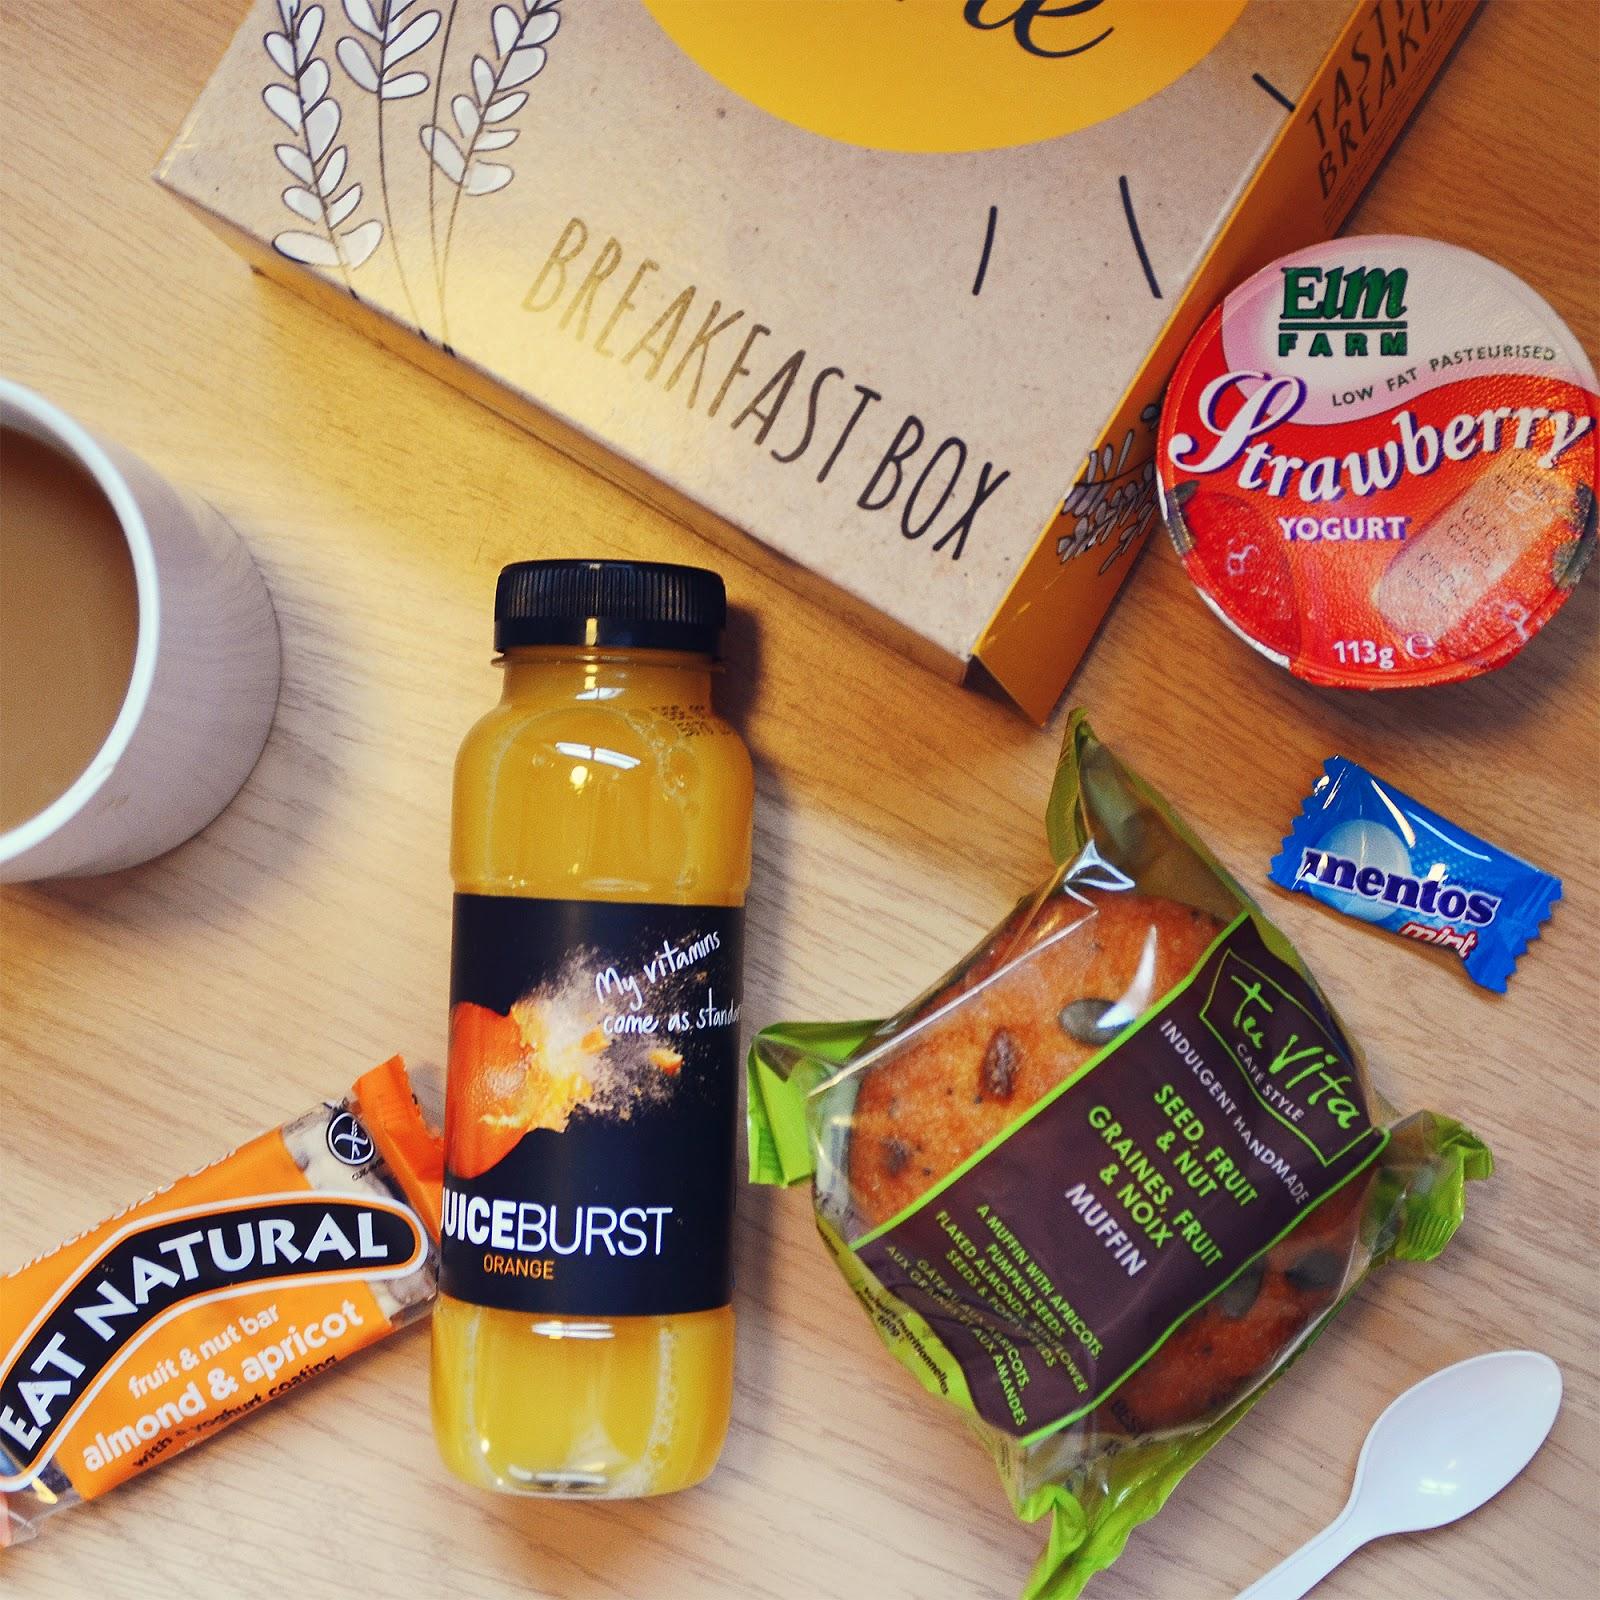 Rise Shine Breakfast Box, muffin, fruit, yoghurt, packed lunch, travelodge